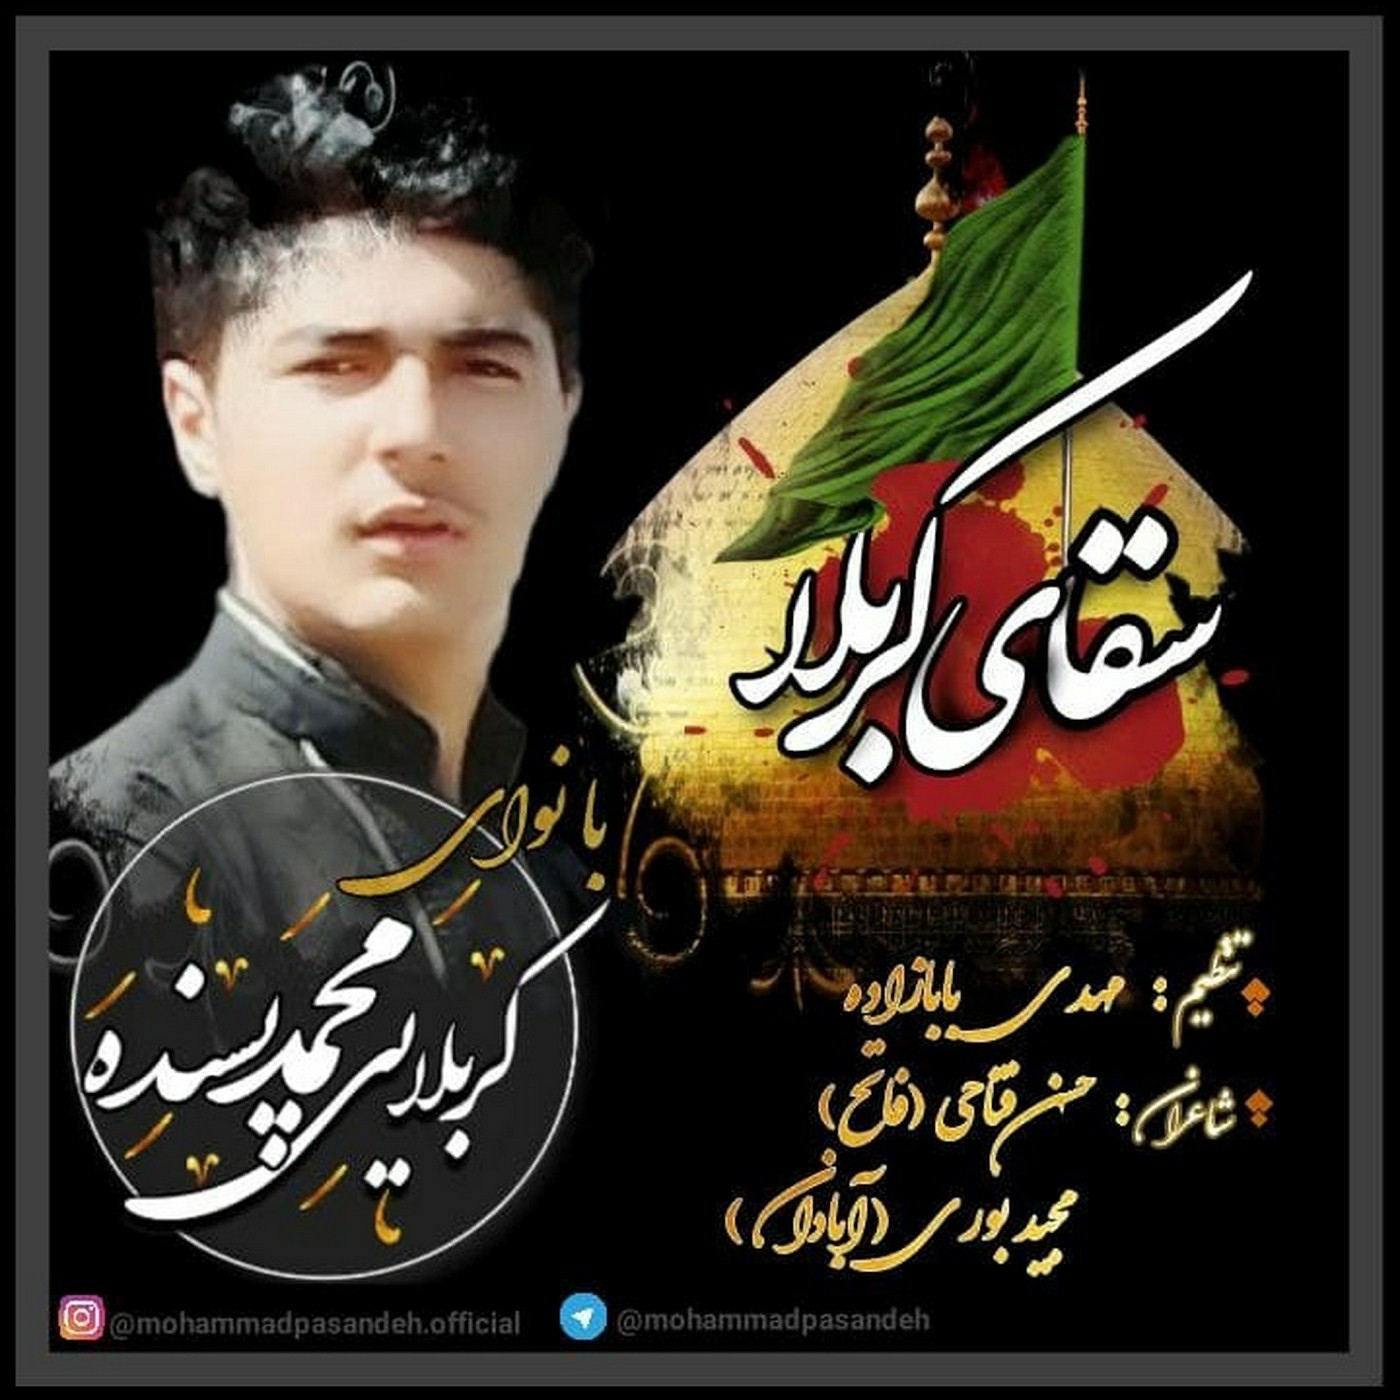 https://s19.picofile.com/file/8439316492/06Mohammad_Pasandeh_Saghaye_Karbala.jpg